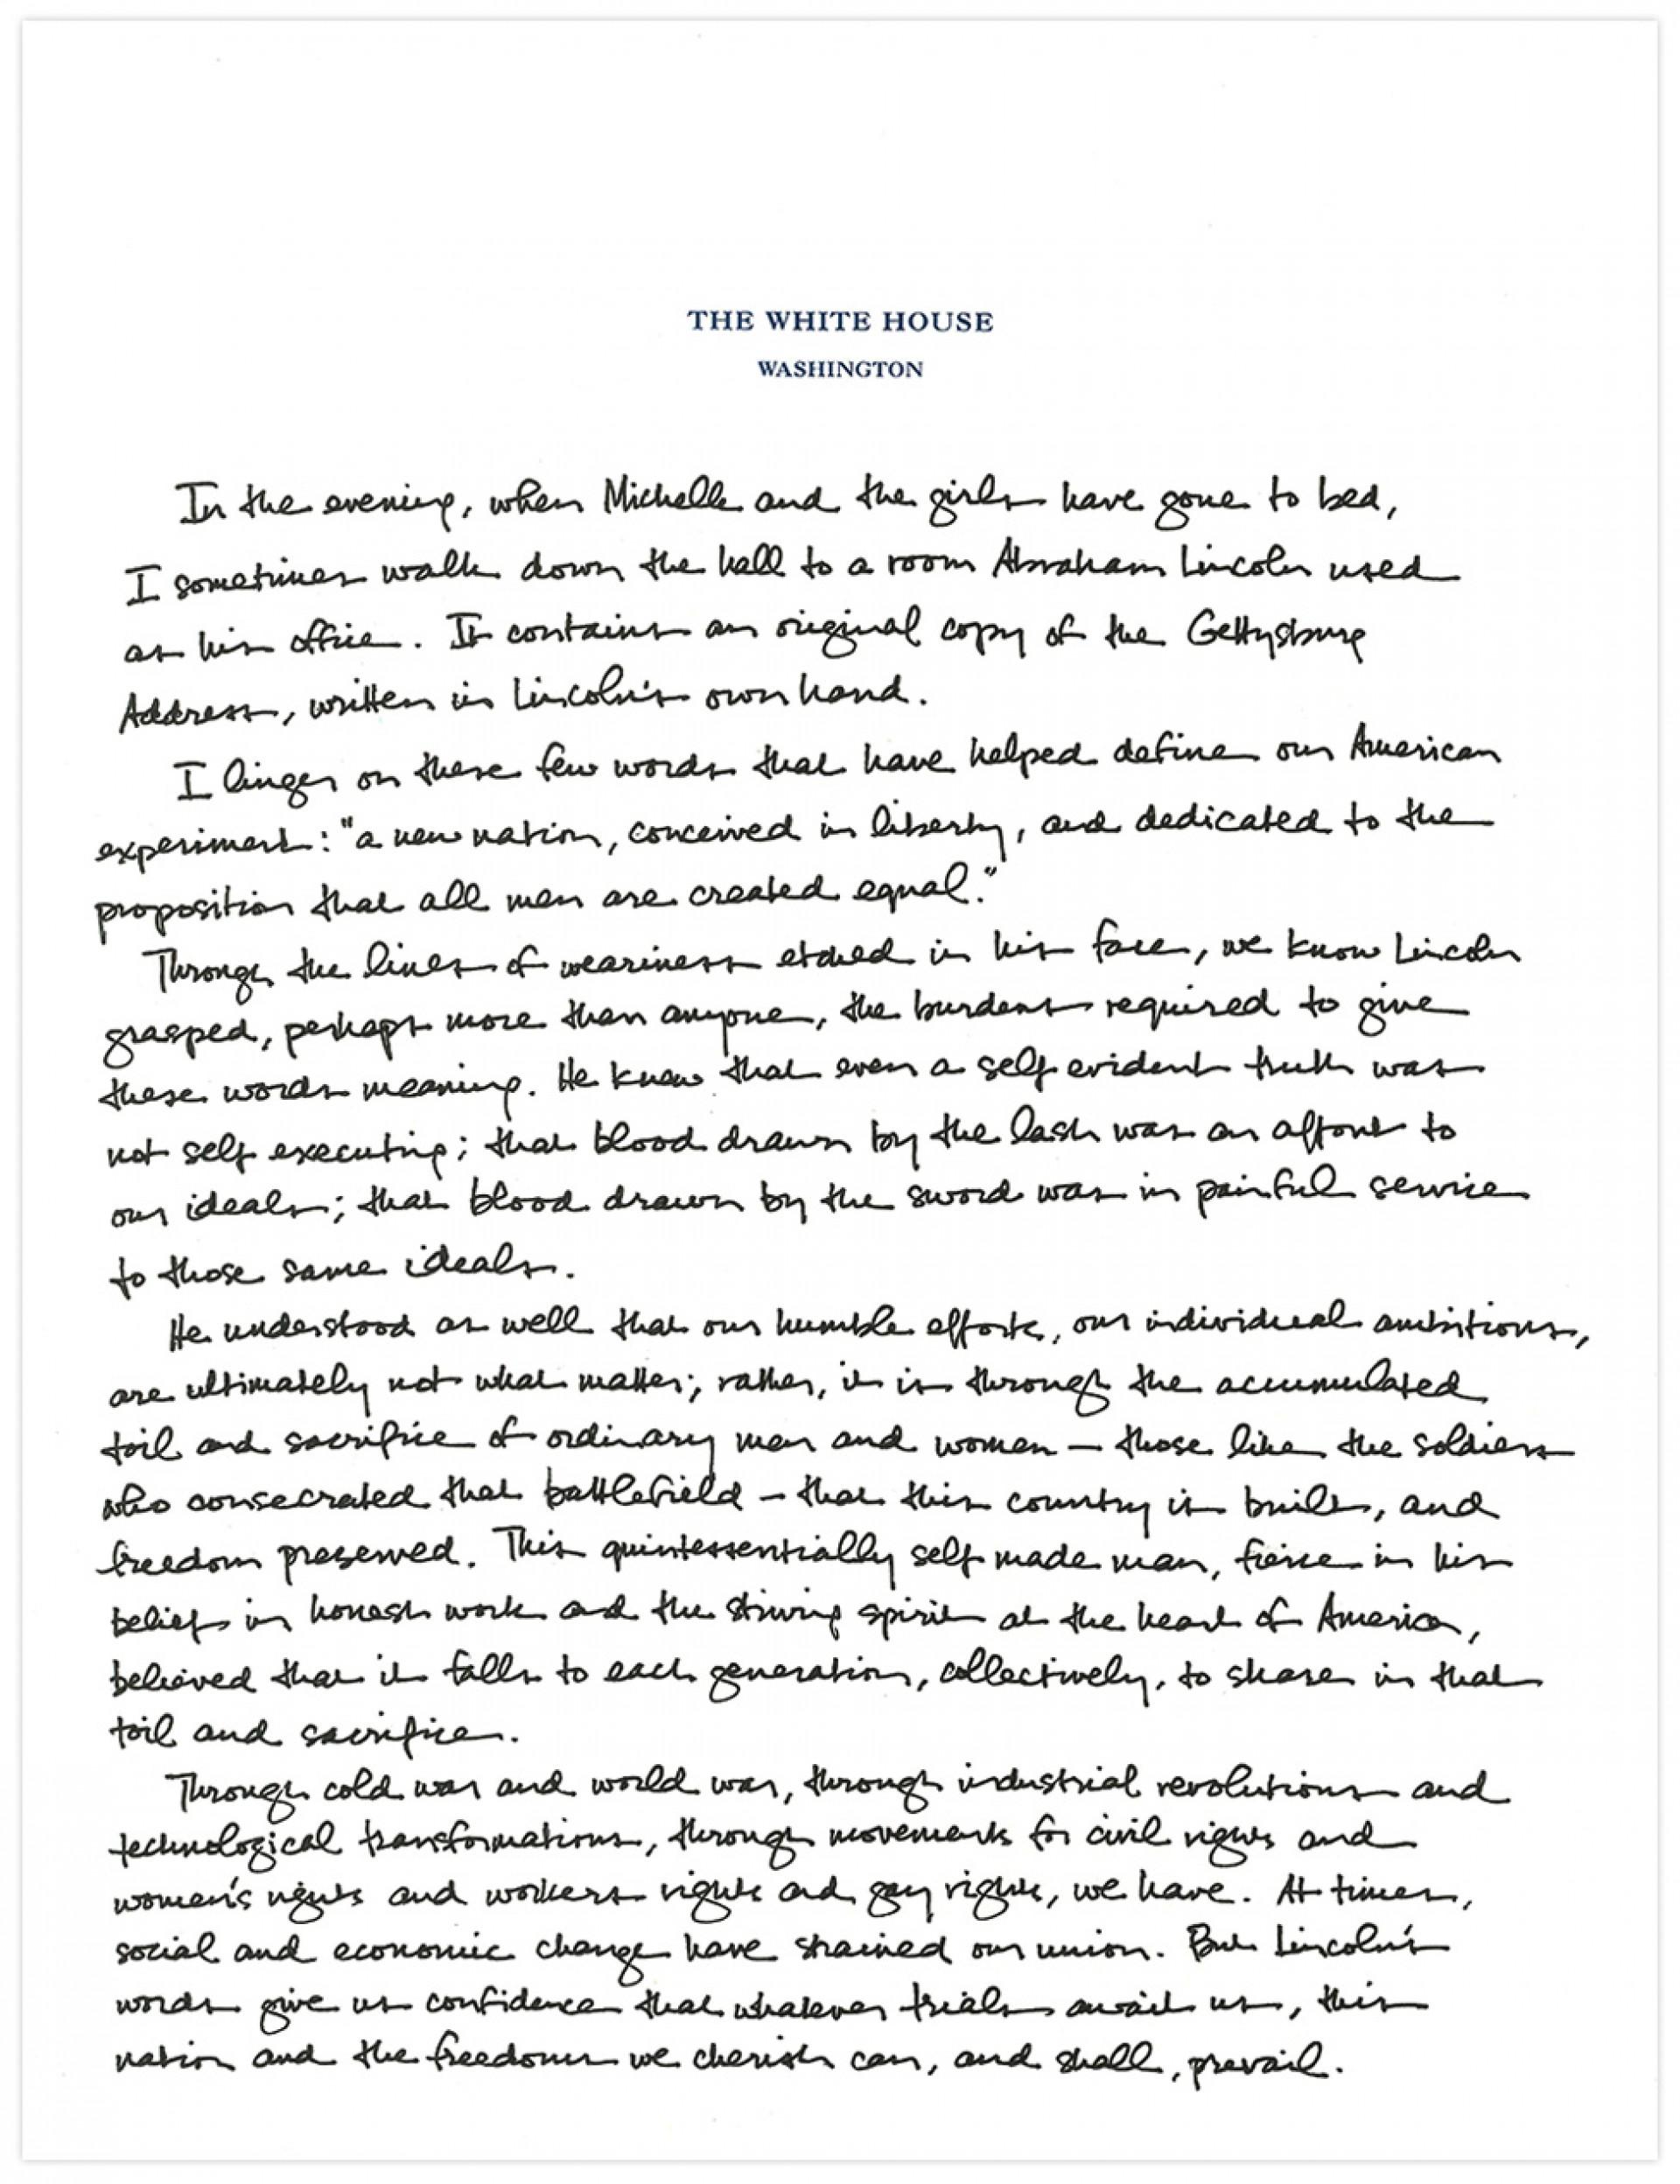 001 Obama Essay Potus Gettysburg Web 2013 Marvelous President Research Paper Barack Pdf Michelle 1920